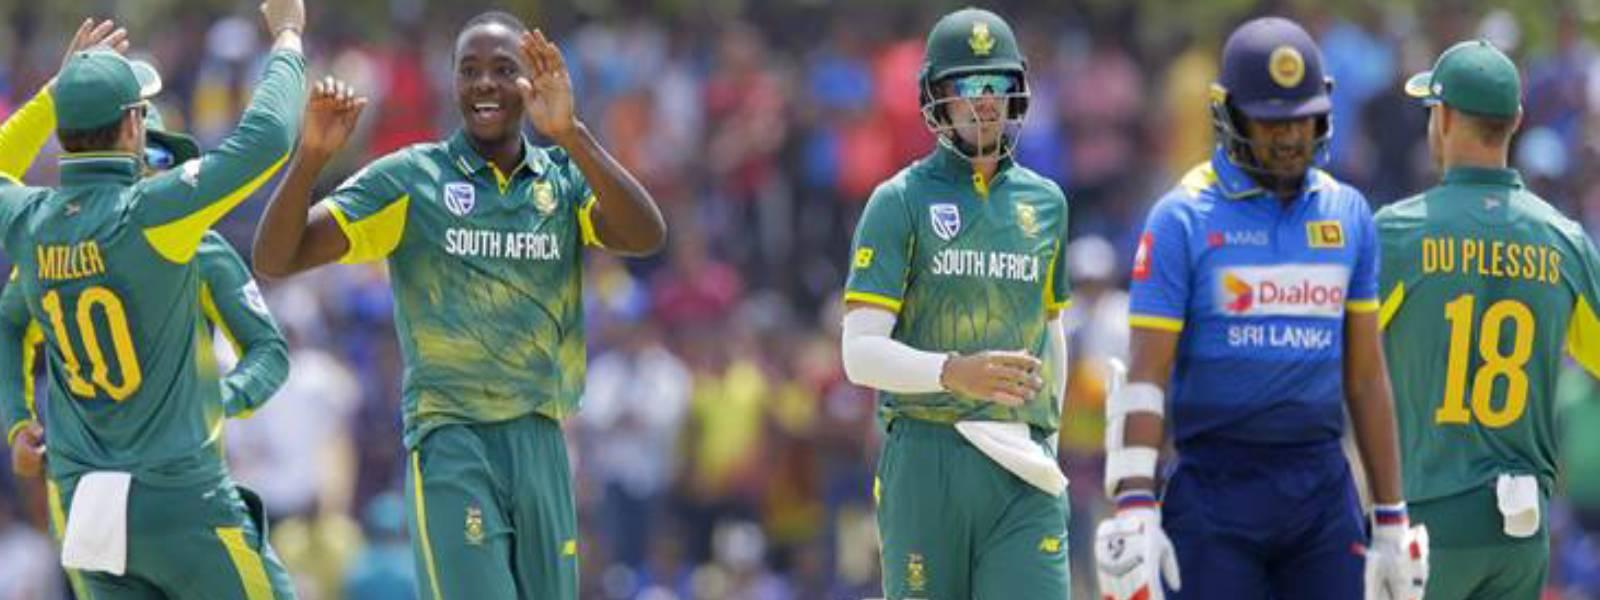 South Africa's tour to Sri Lanka postponed : SLC